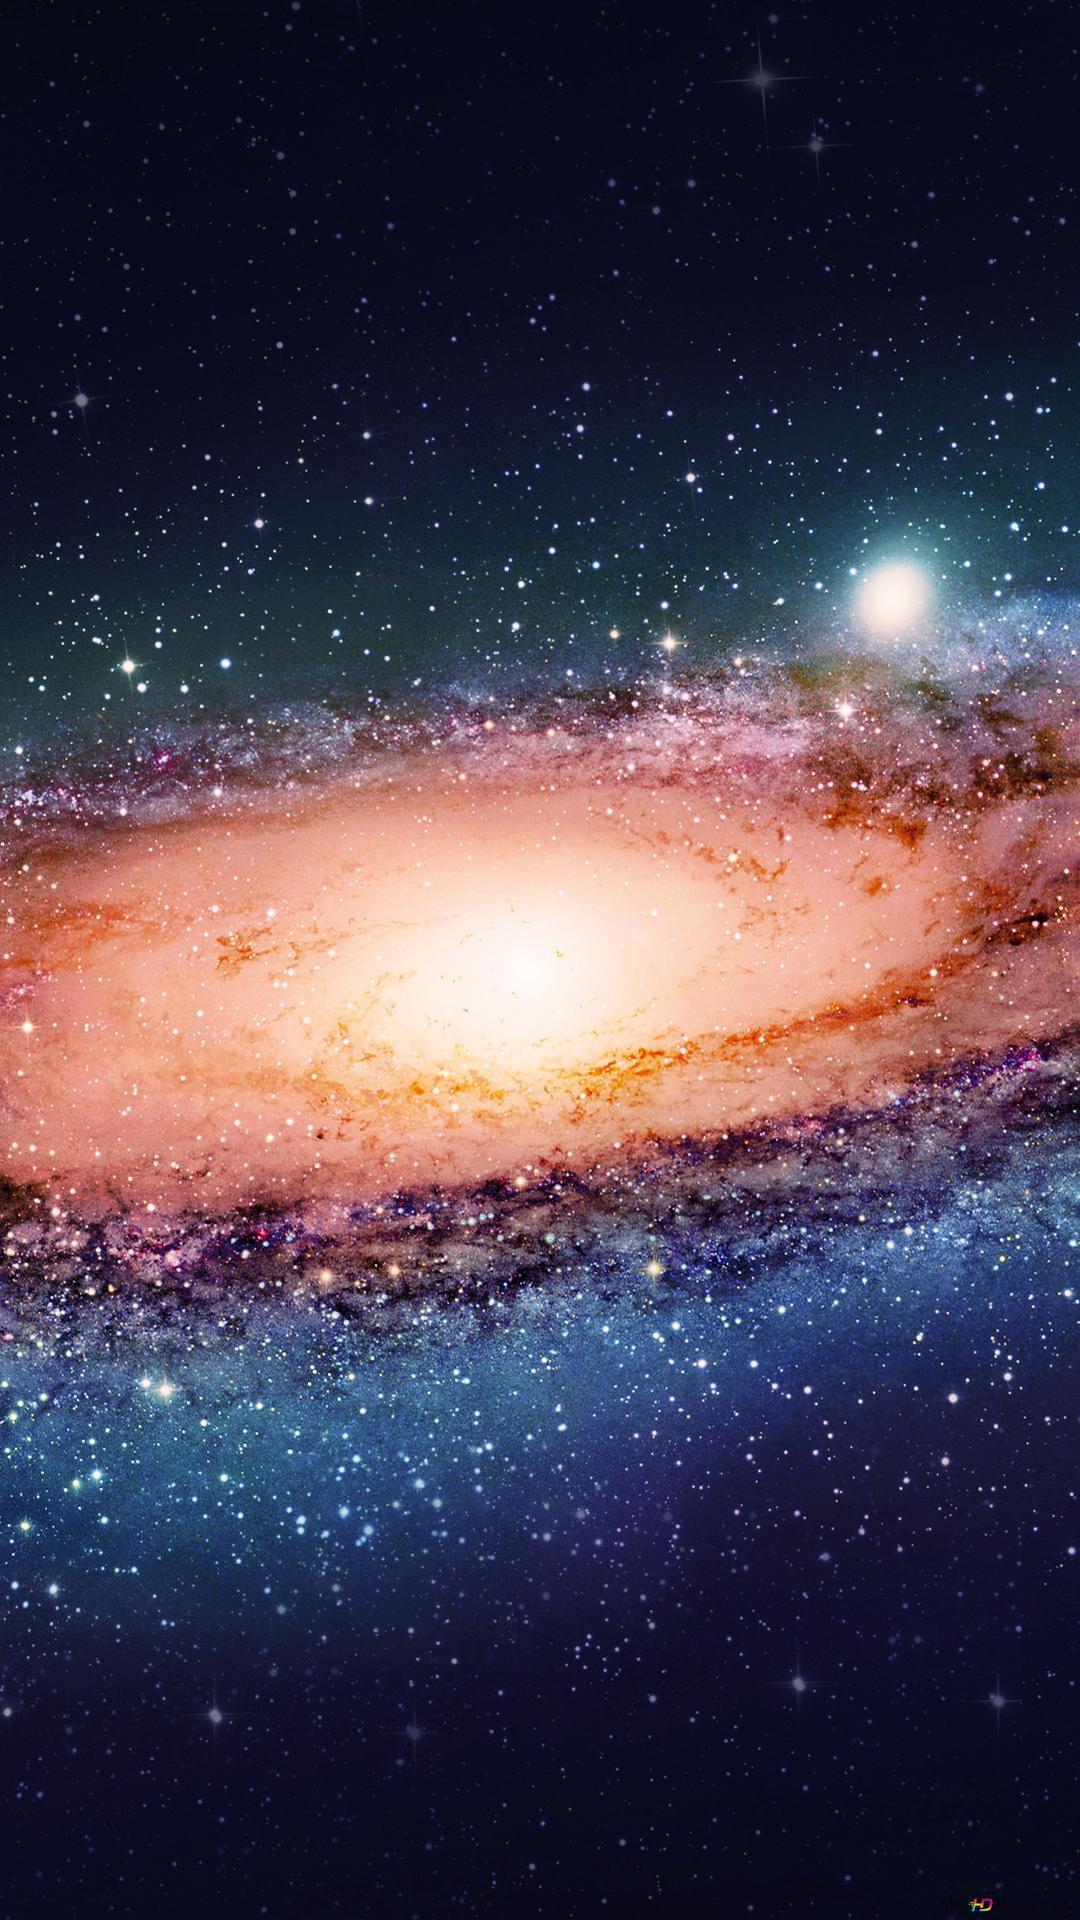 Grande Galaxie Dans L Espace Hd Fond D Ecran Telecharger